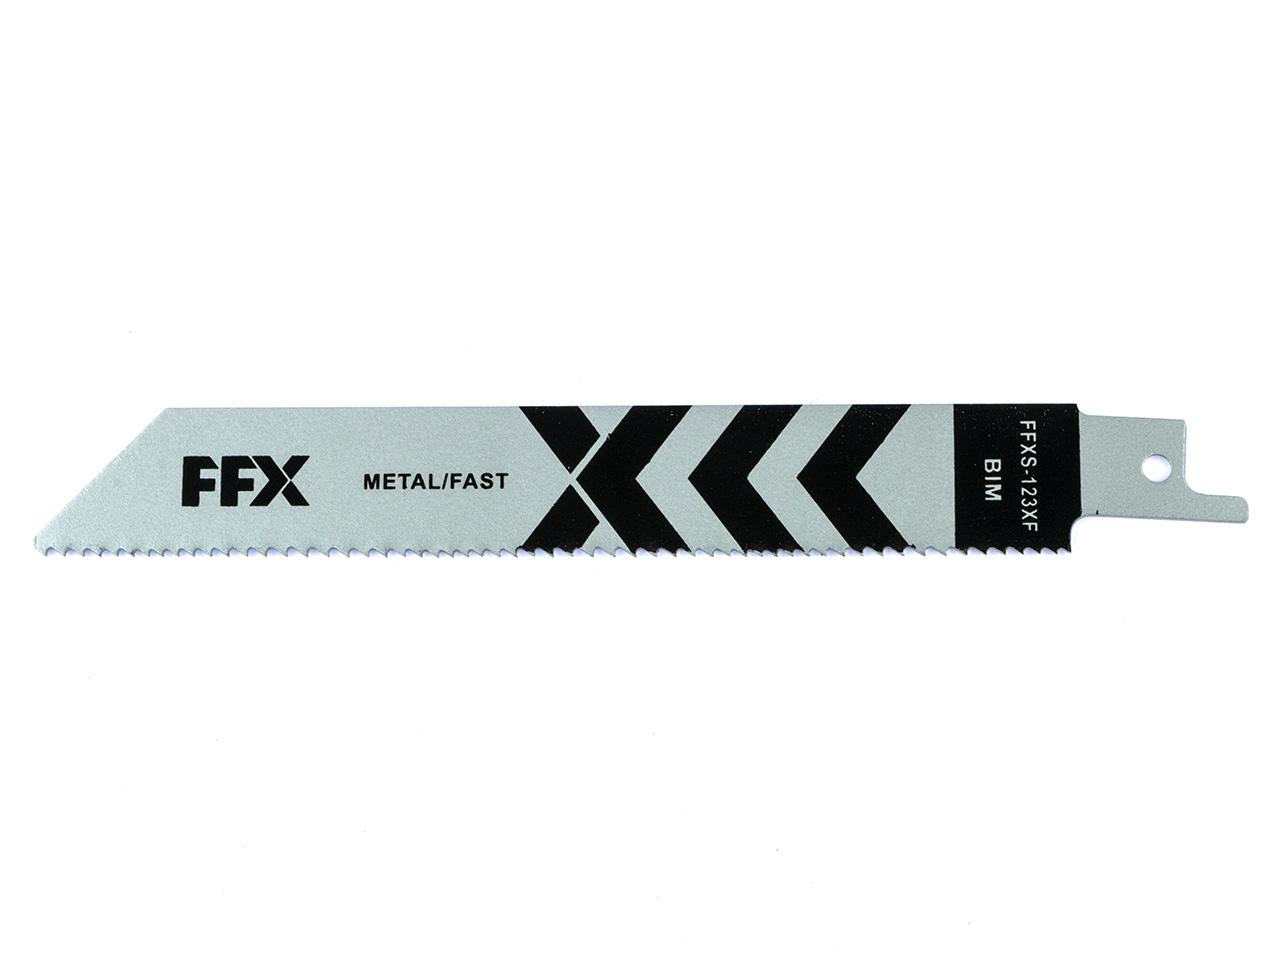 FFX_QQ0102400090.jpg